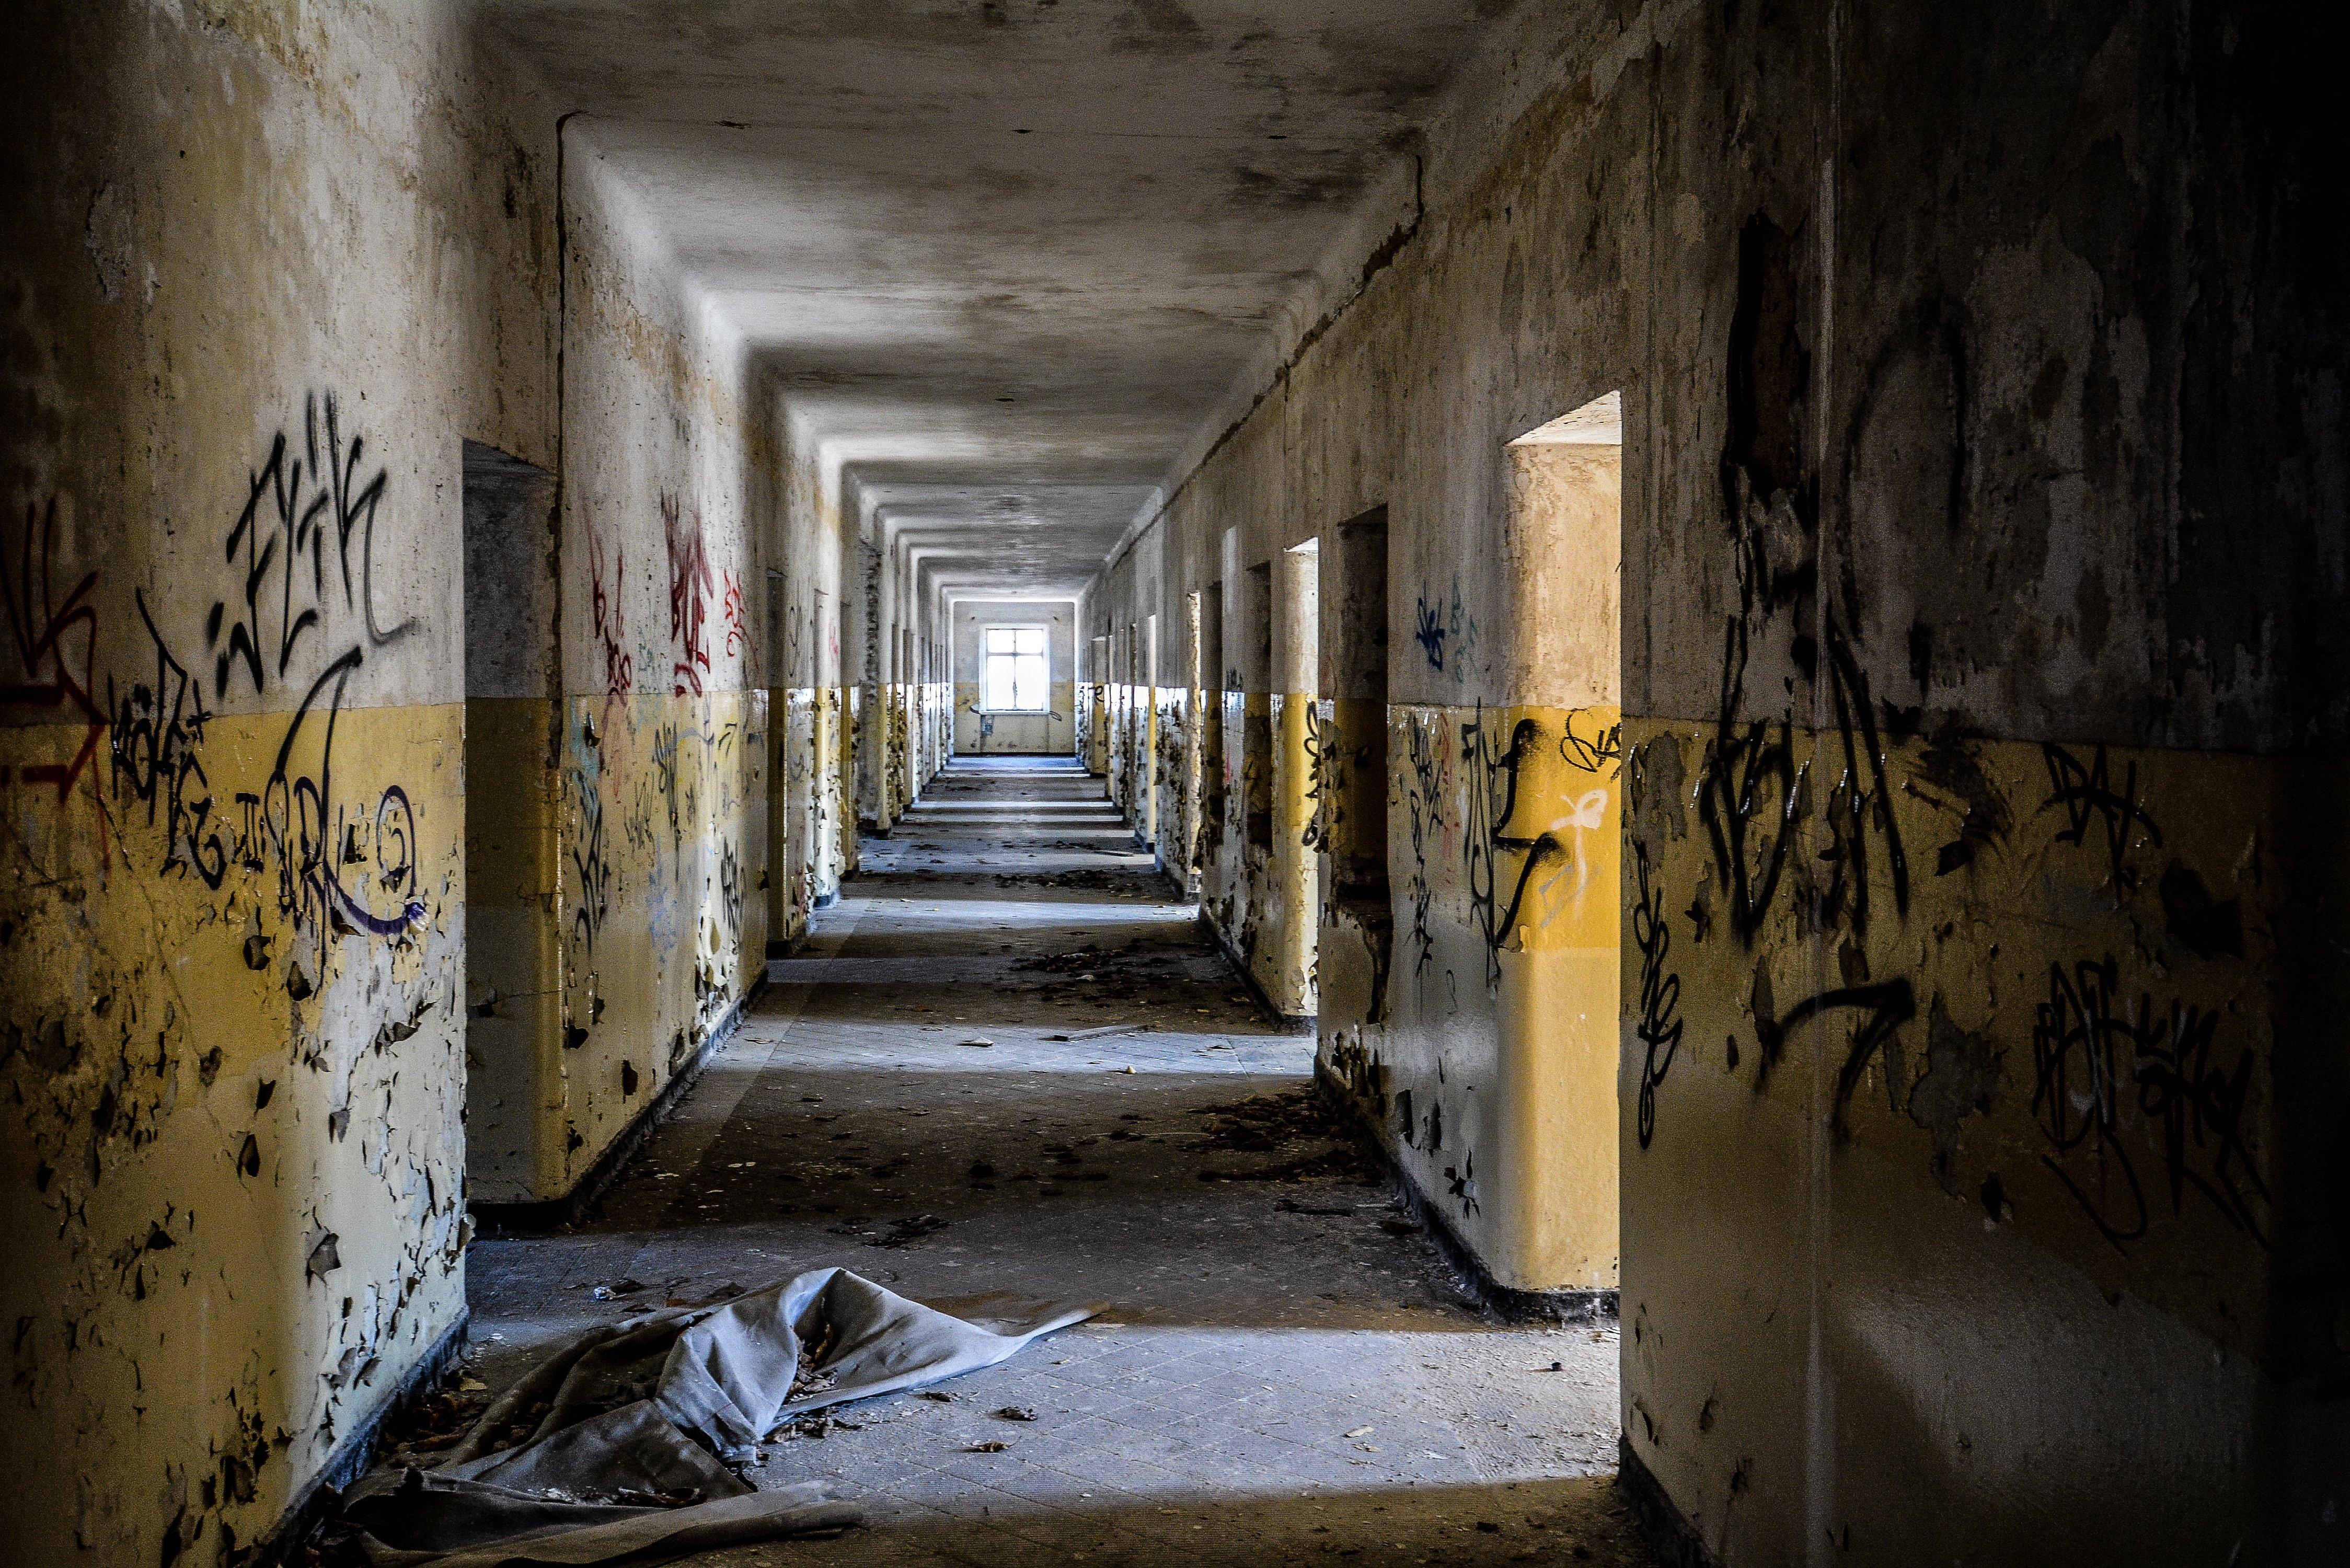 graffiti hallway nazi soviet military base abandoned urbex urban exploring loewen adler kaserne elstal wustermark roter stern kaserne germany lost places